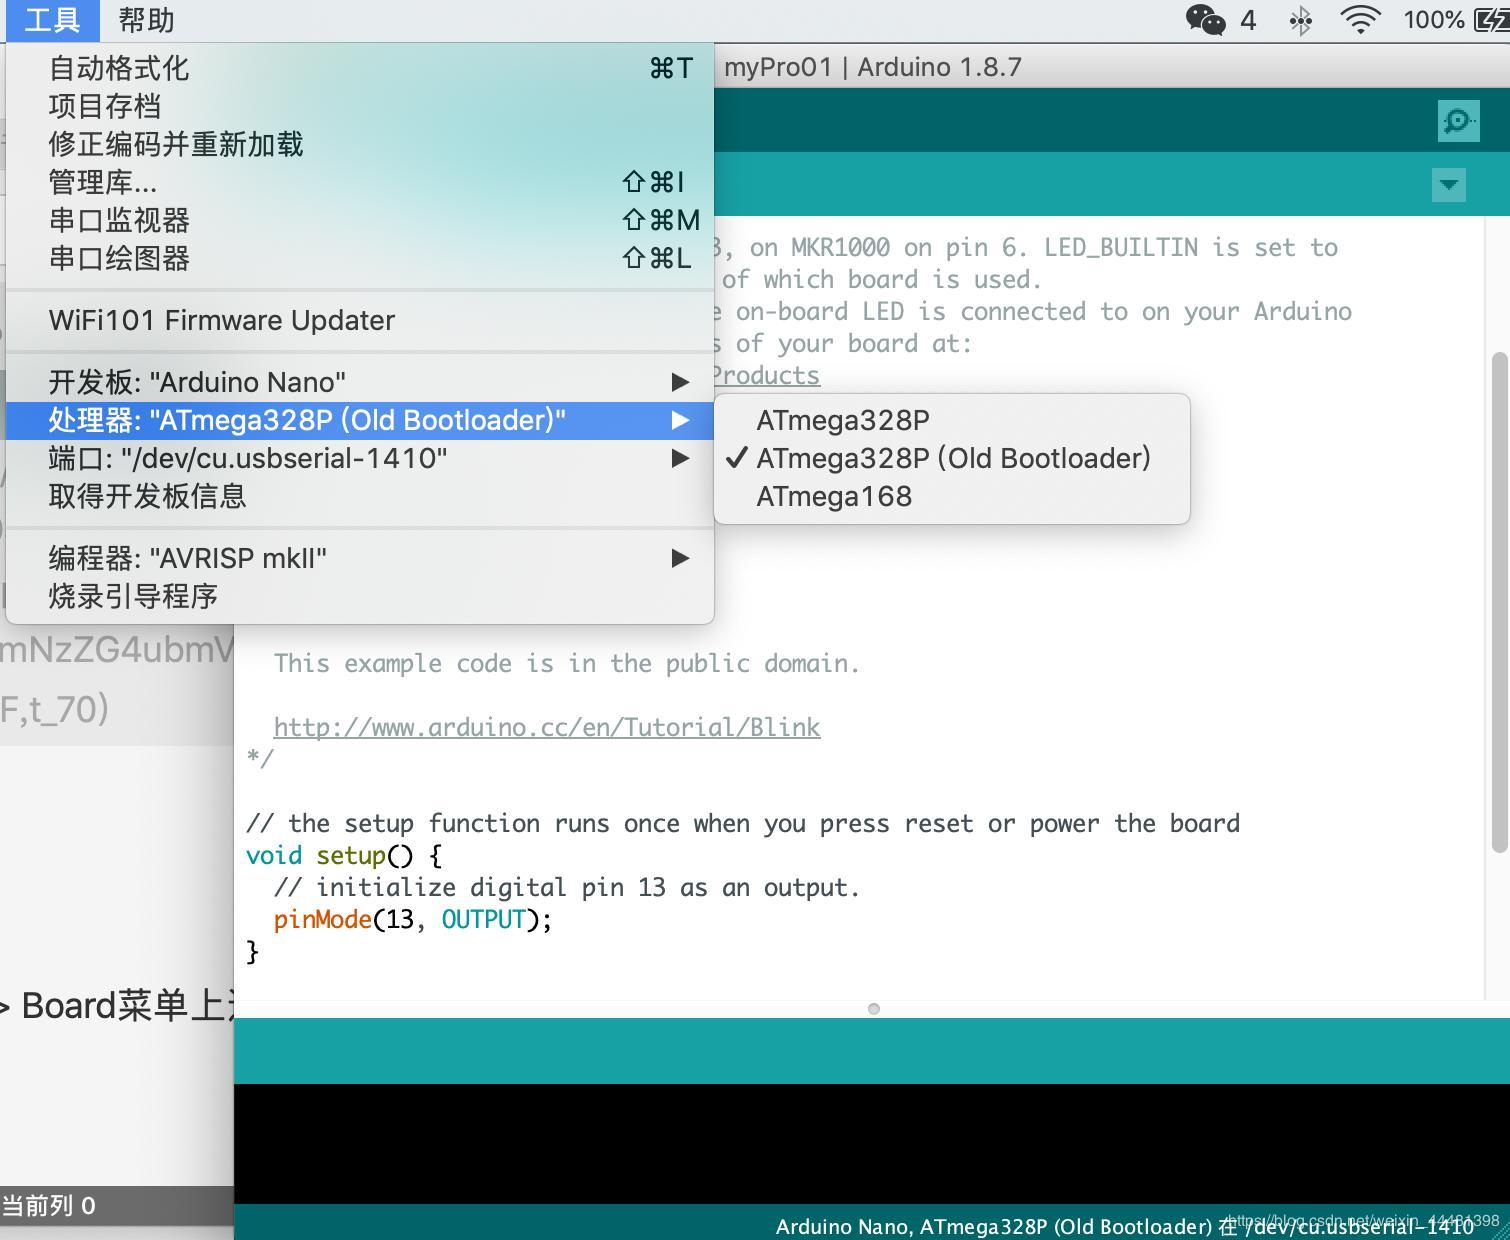 First time using Arduino Nano - Programmer Sought